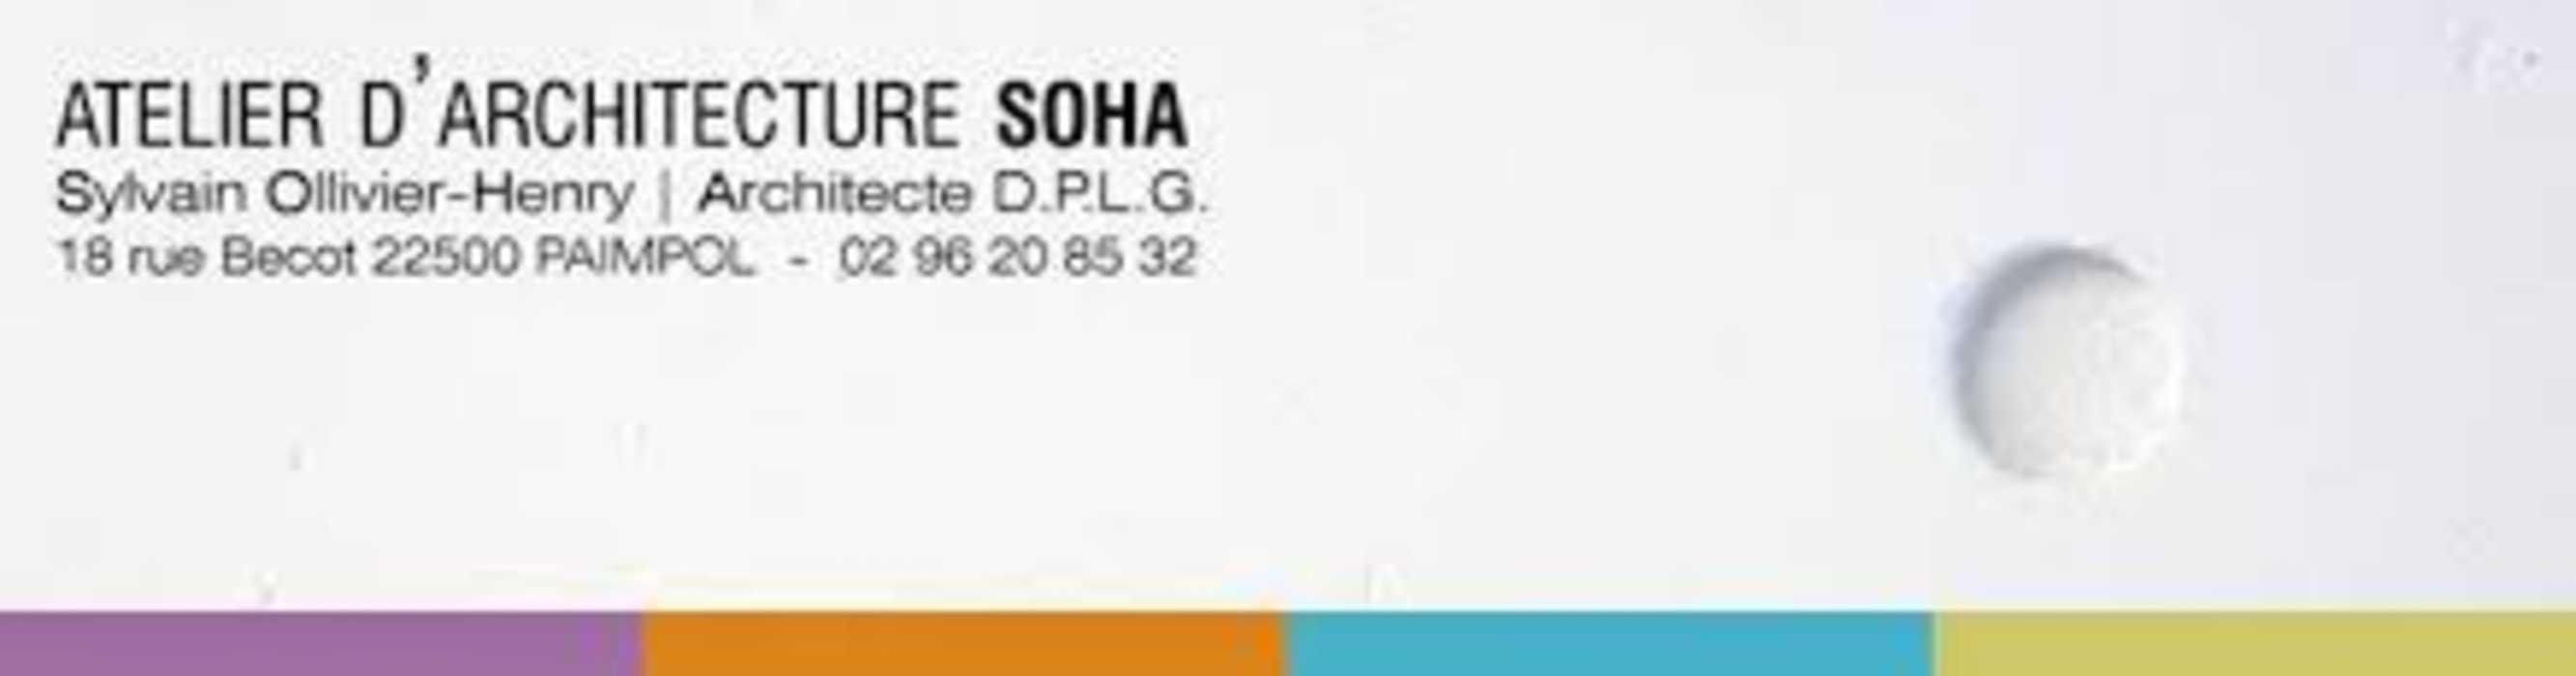 Atelier d''Architecture Soha 0